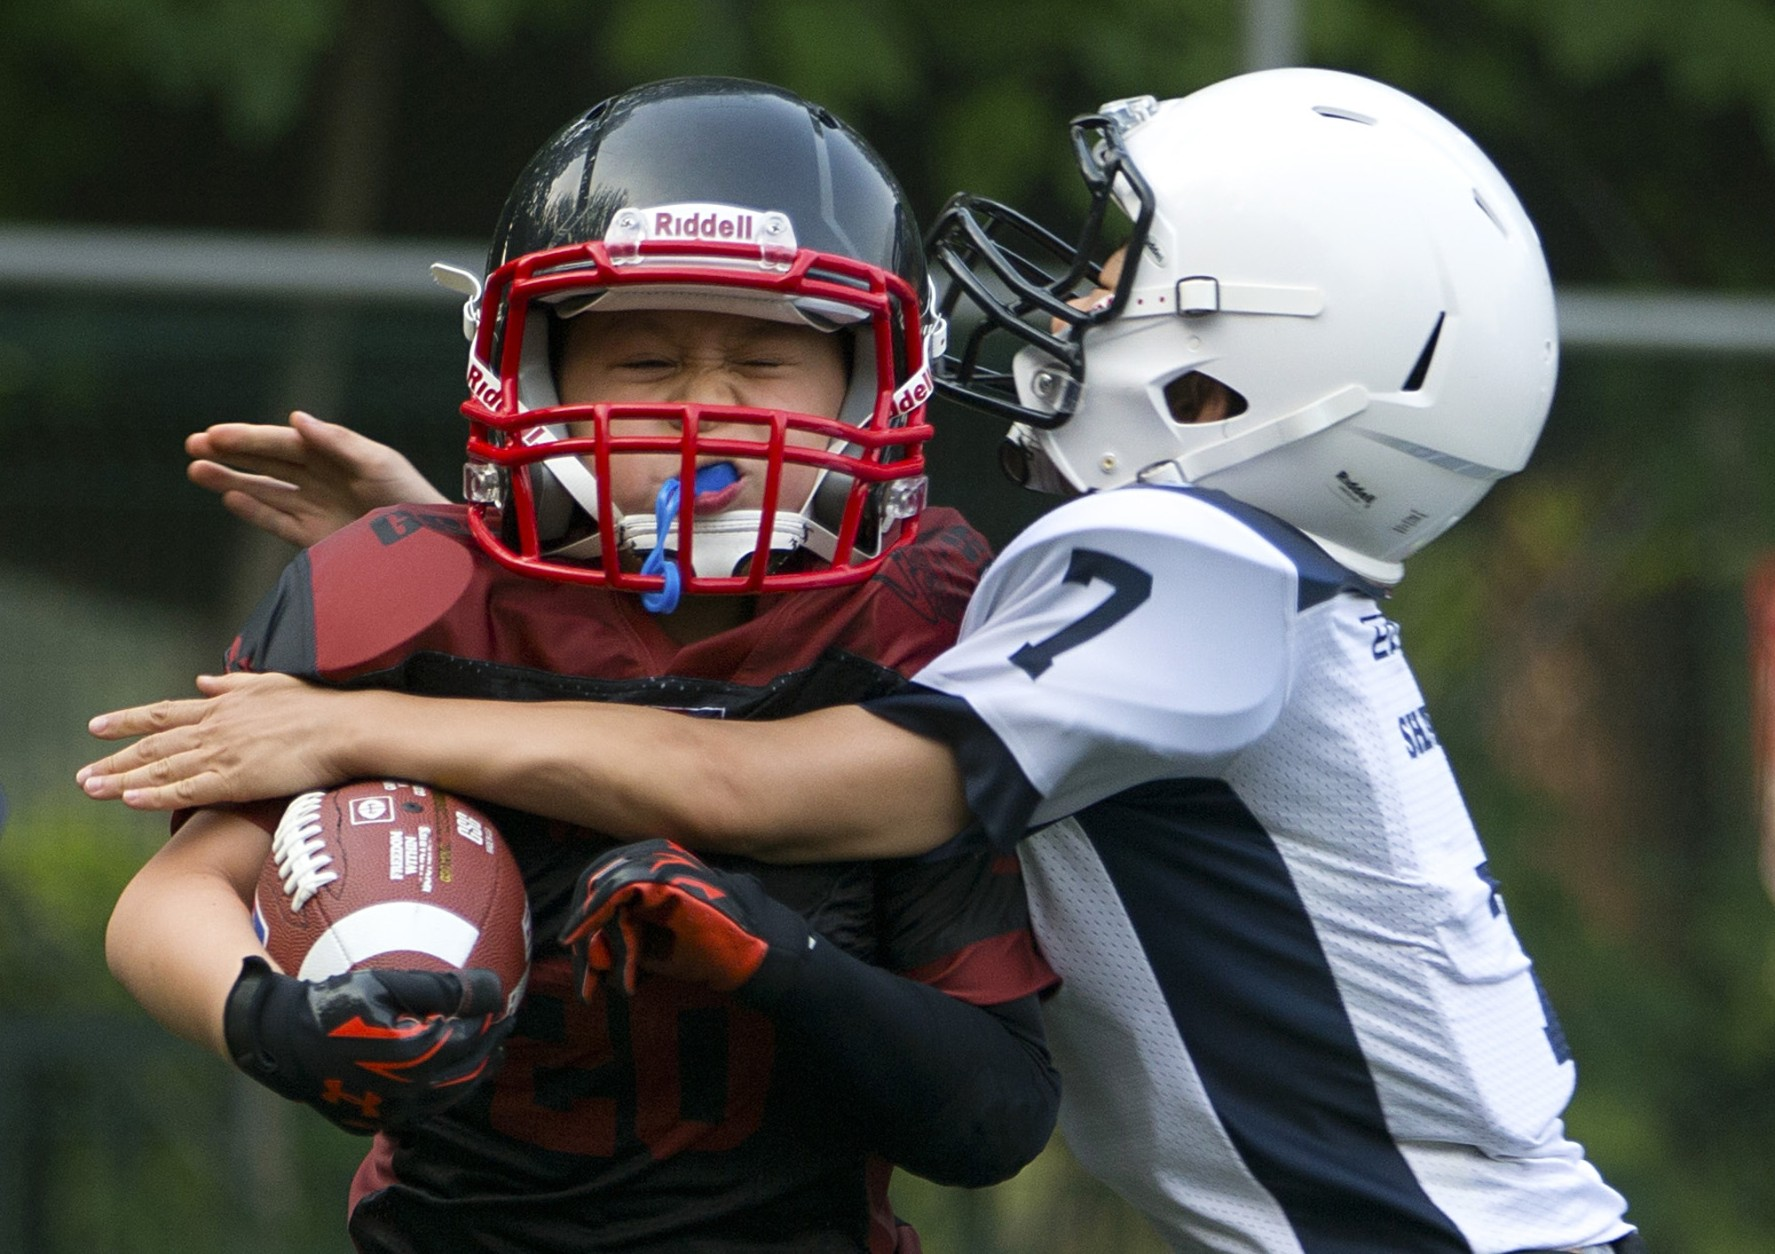 Pee wee football helmets